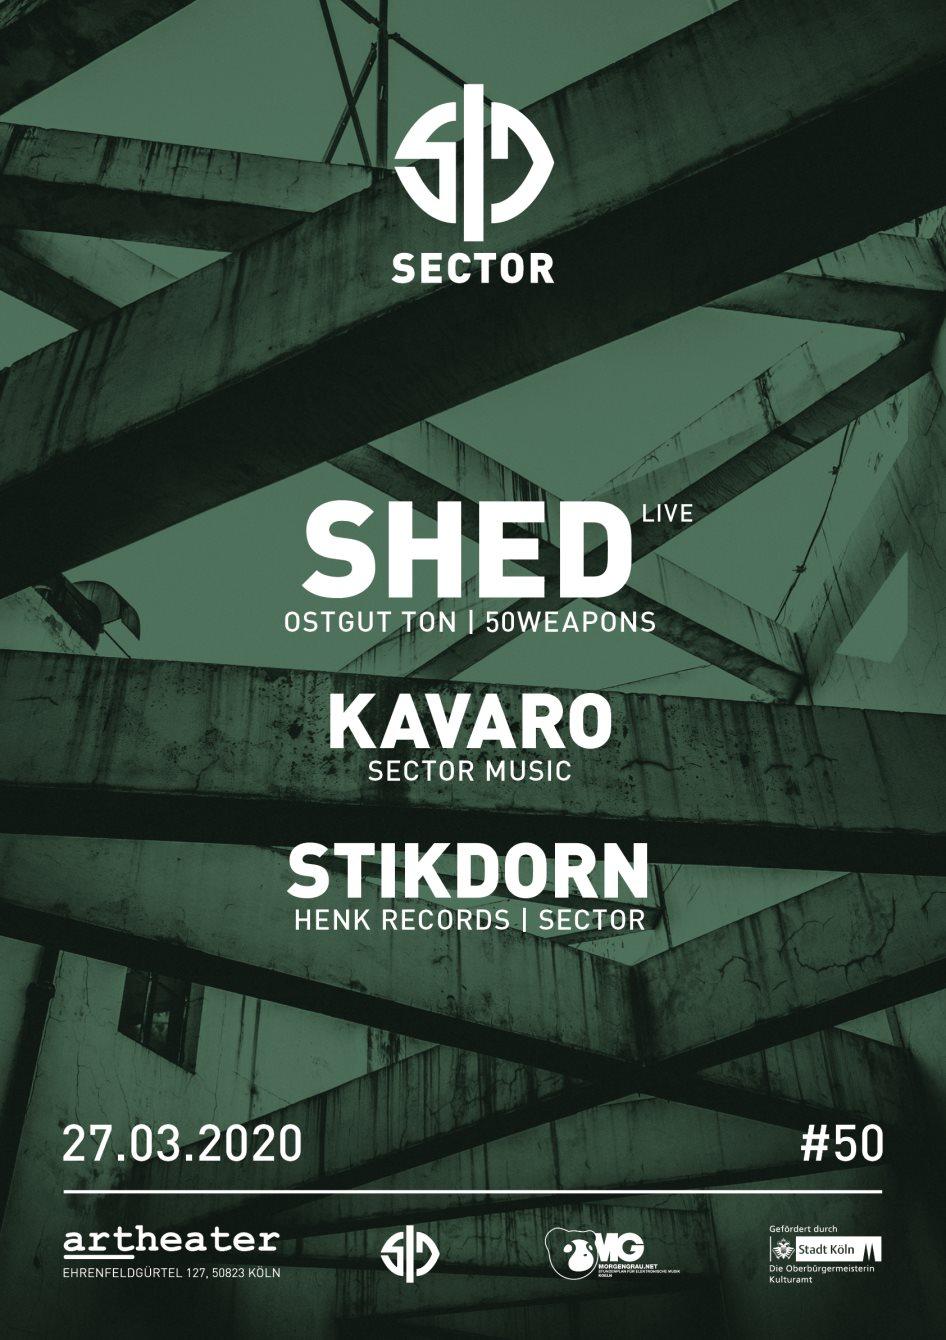 Postponed! Sector with Shed - Live, Stikdorn & Kavaro - Flyer front